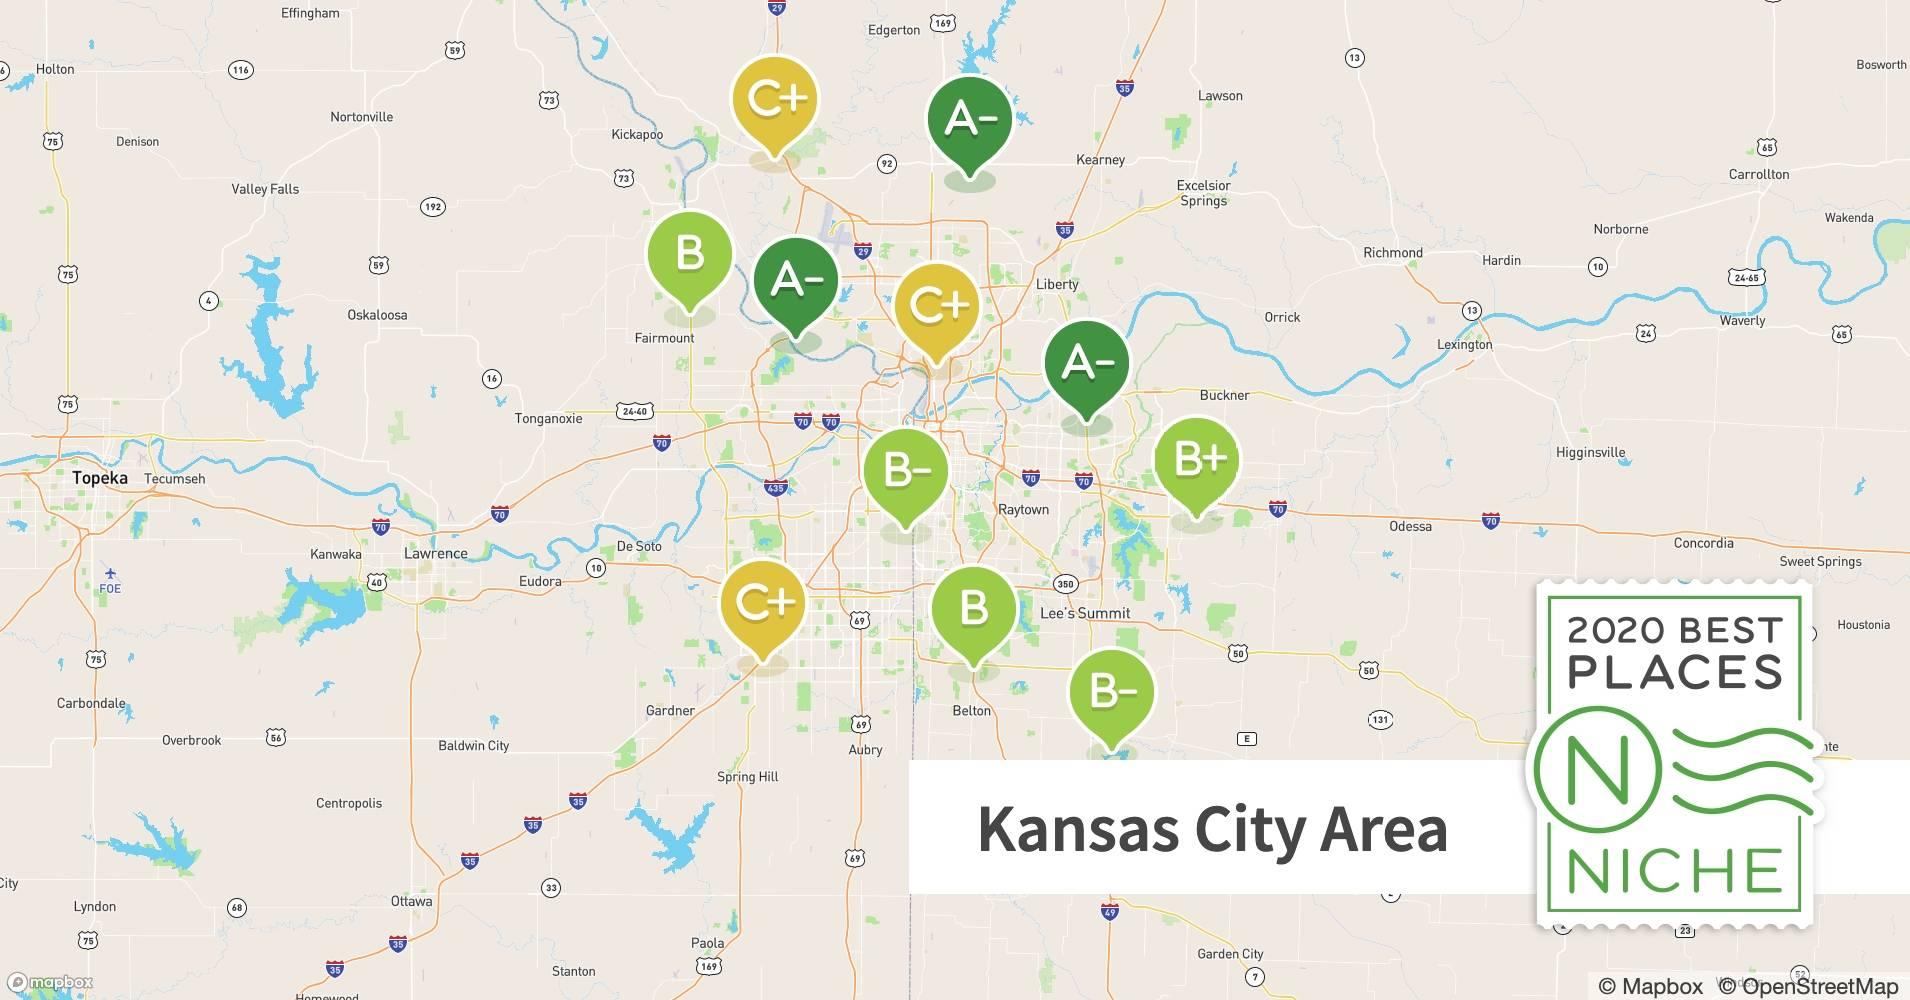 2020 Best Kansas City Area Suburbs To Live Niche